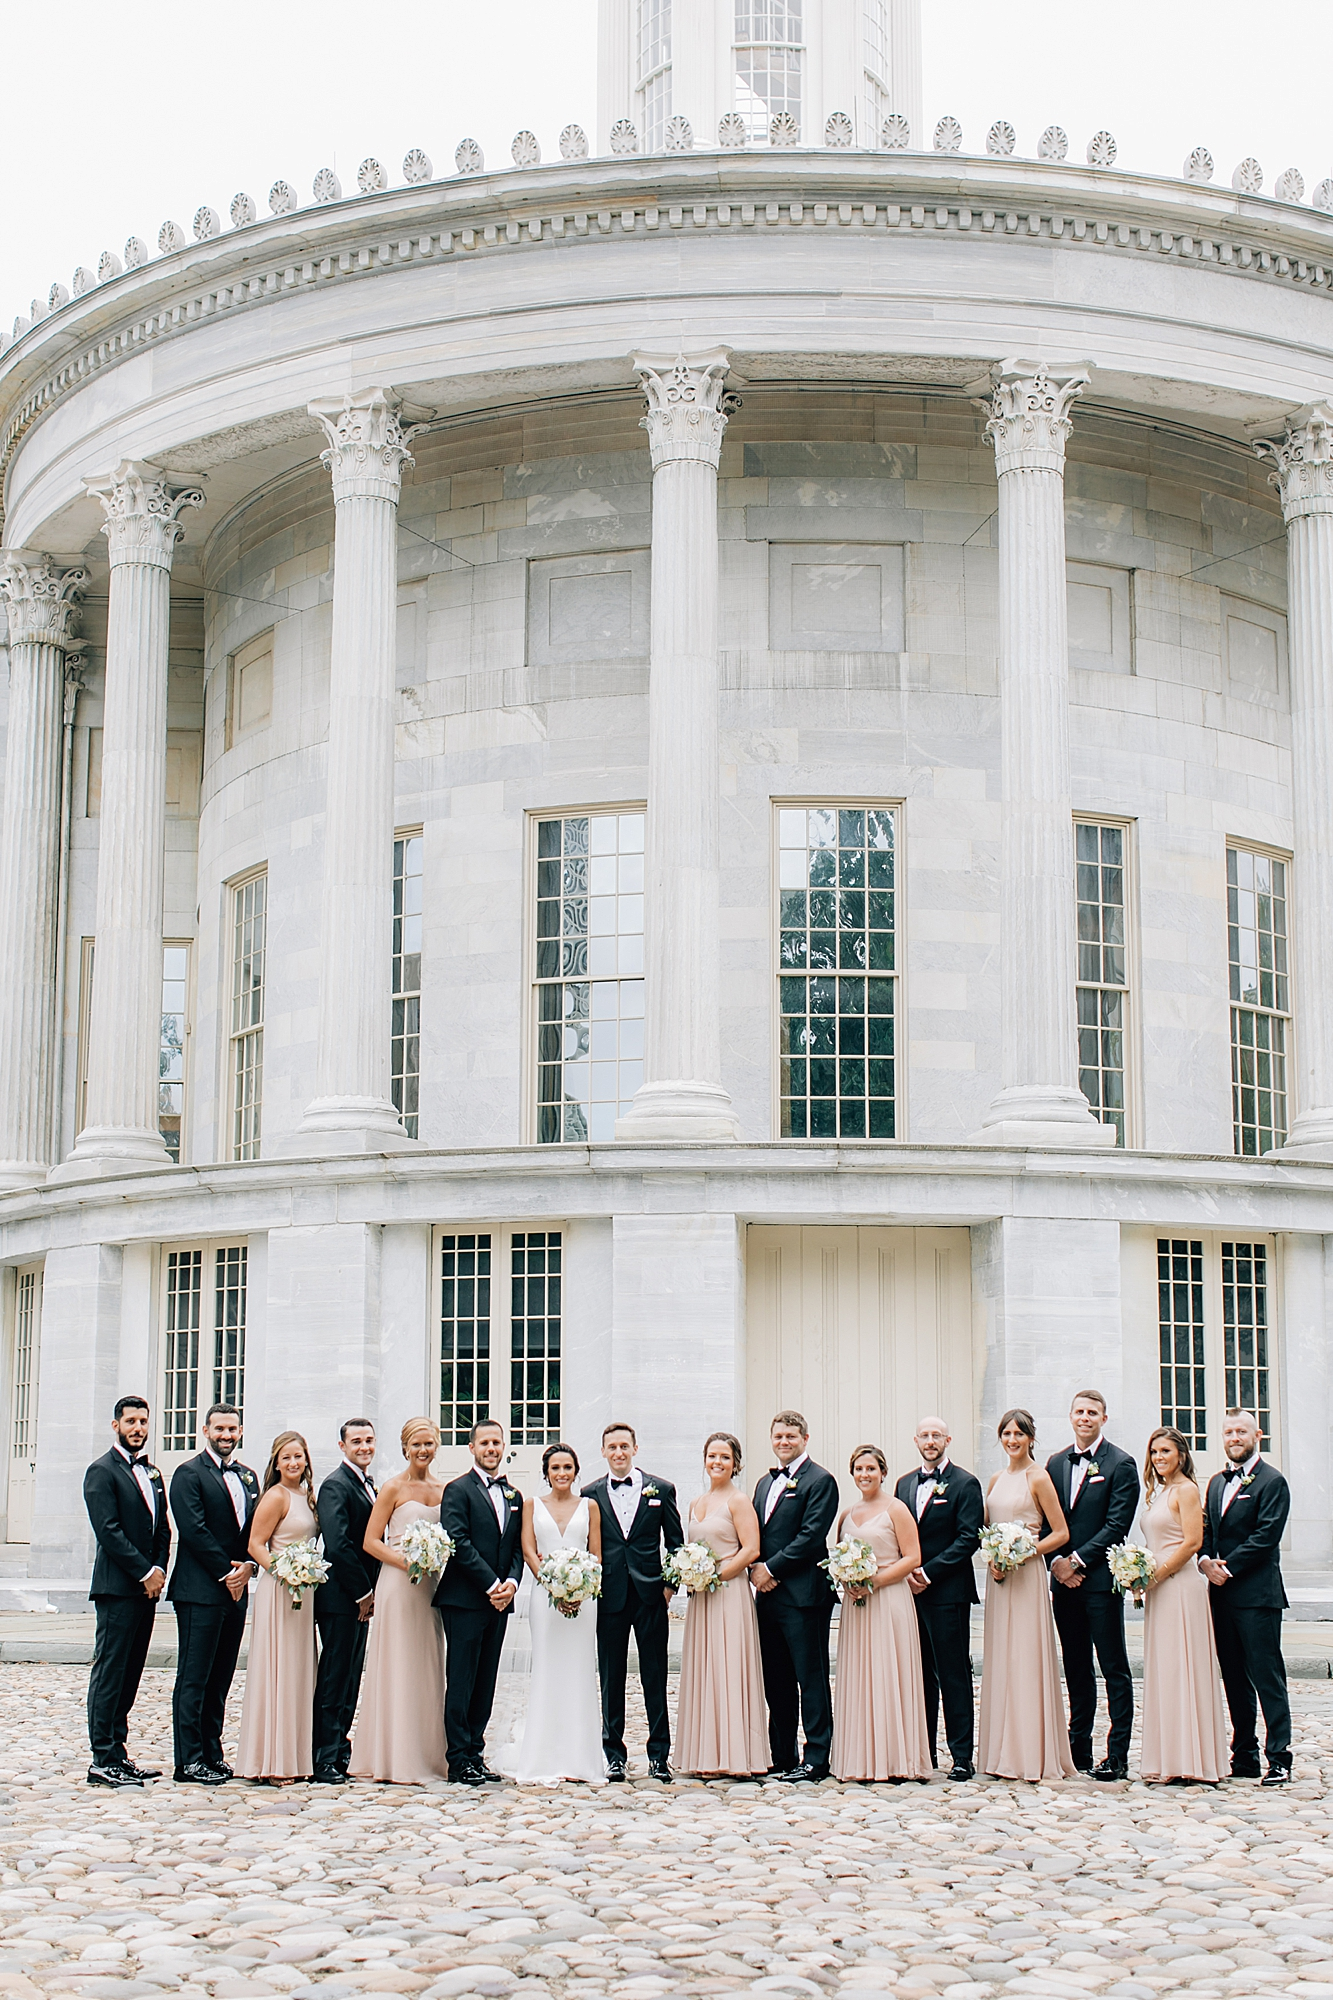 Cescaphe Philadelphia Film Wedding Photography by Magdalena Studios 23